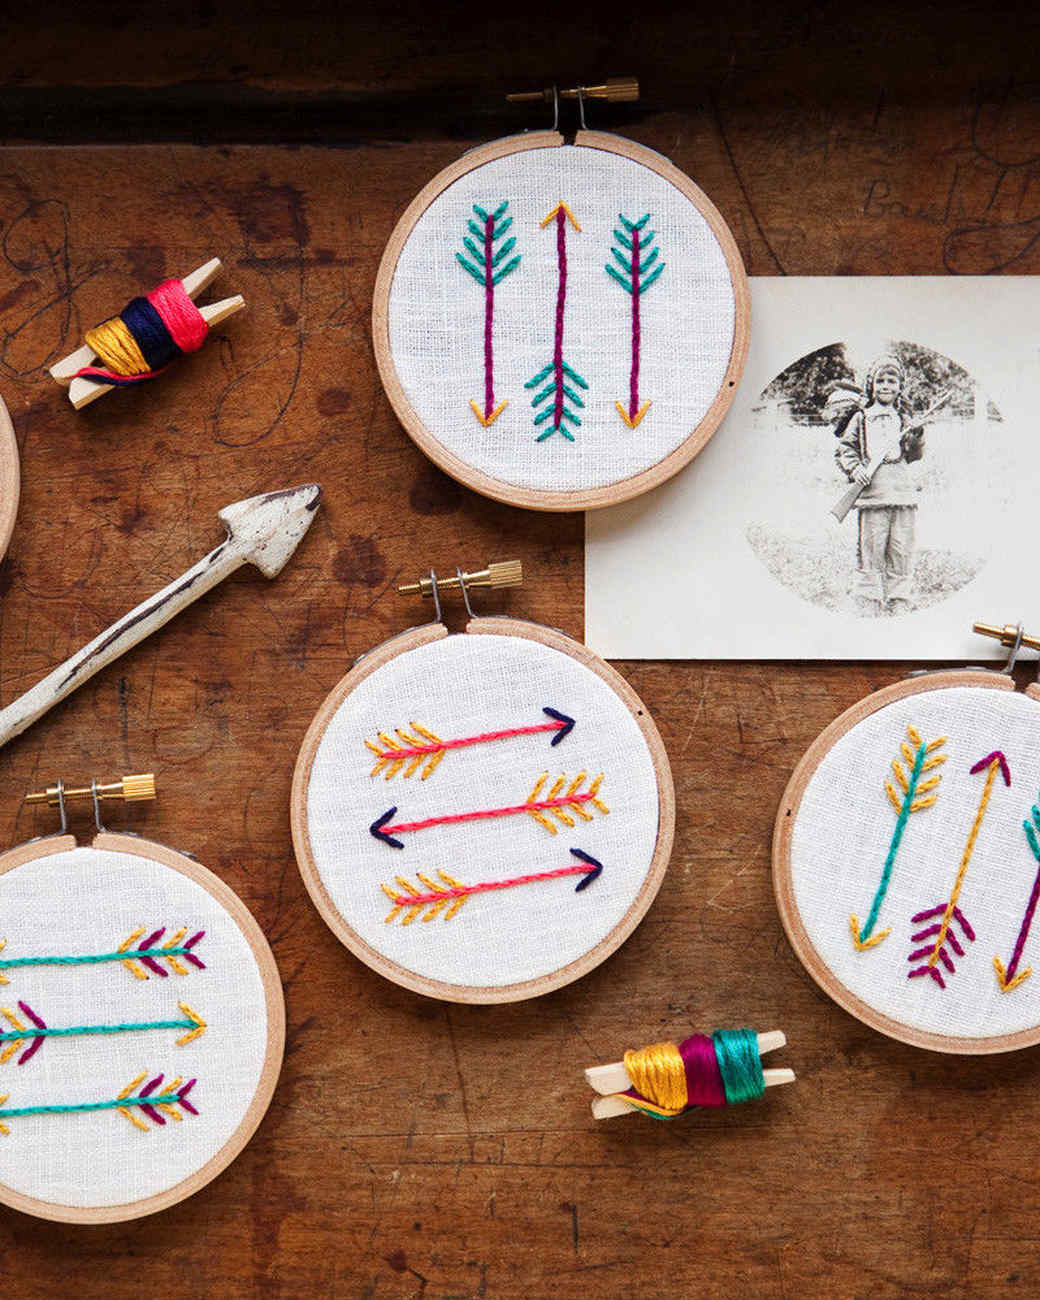 miniature-rhino-embroidery-kit-0714.jpg